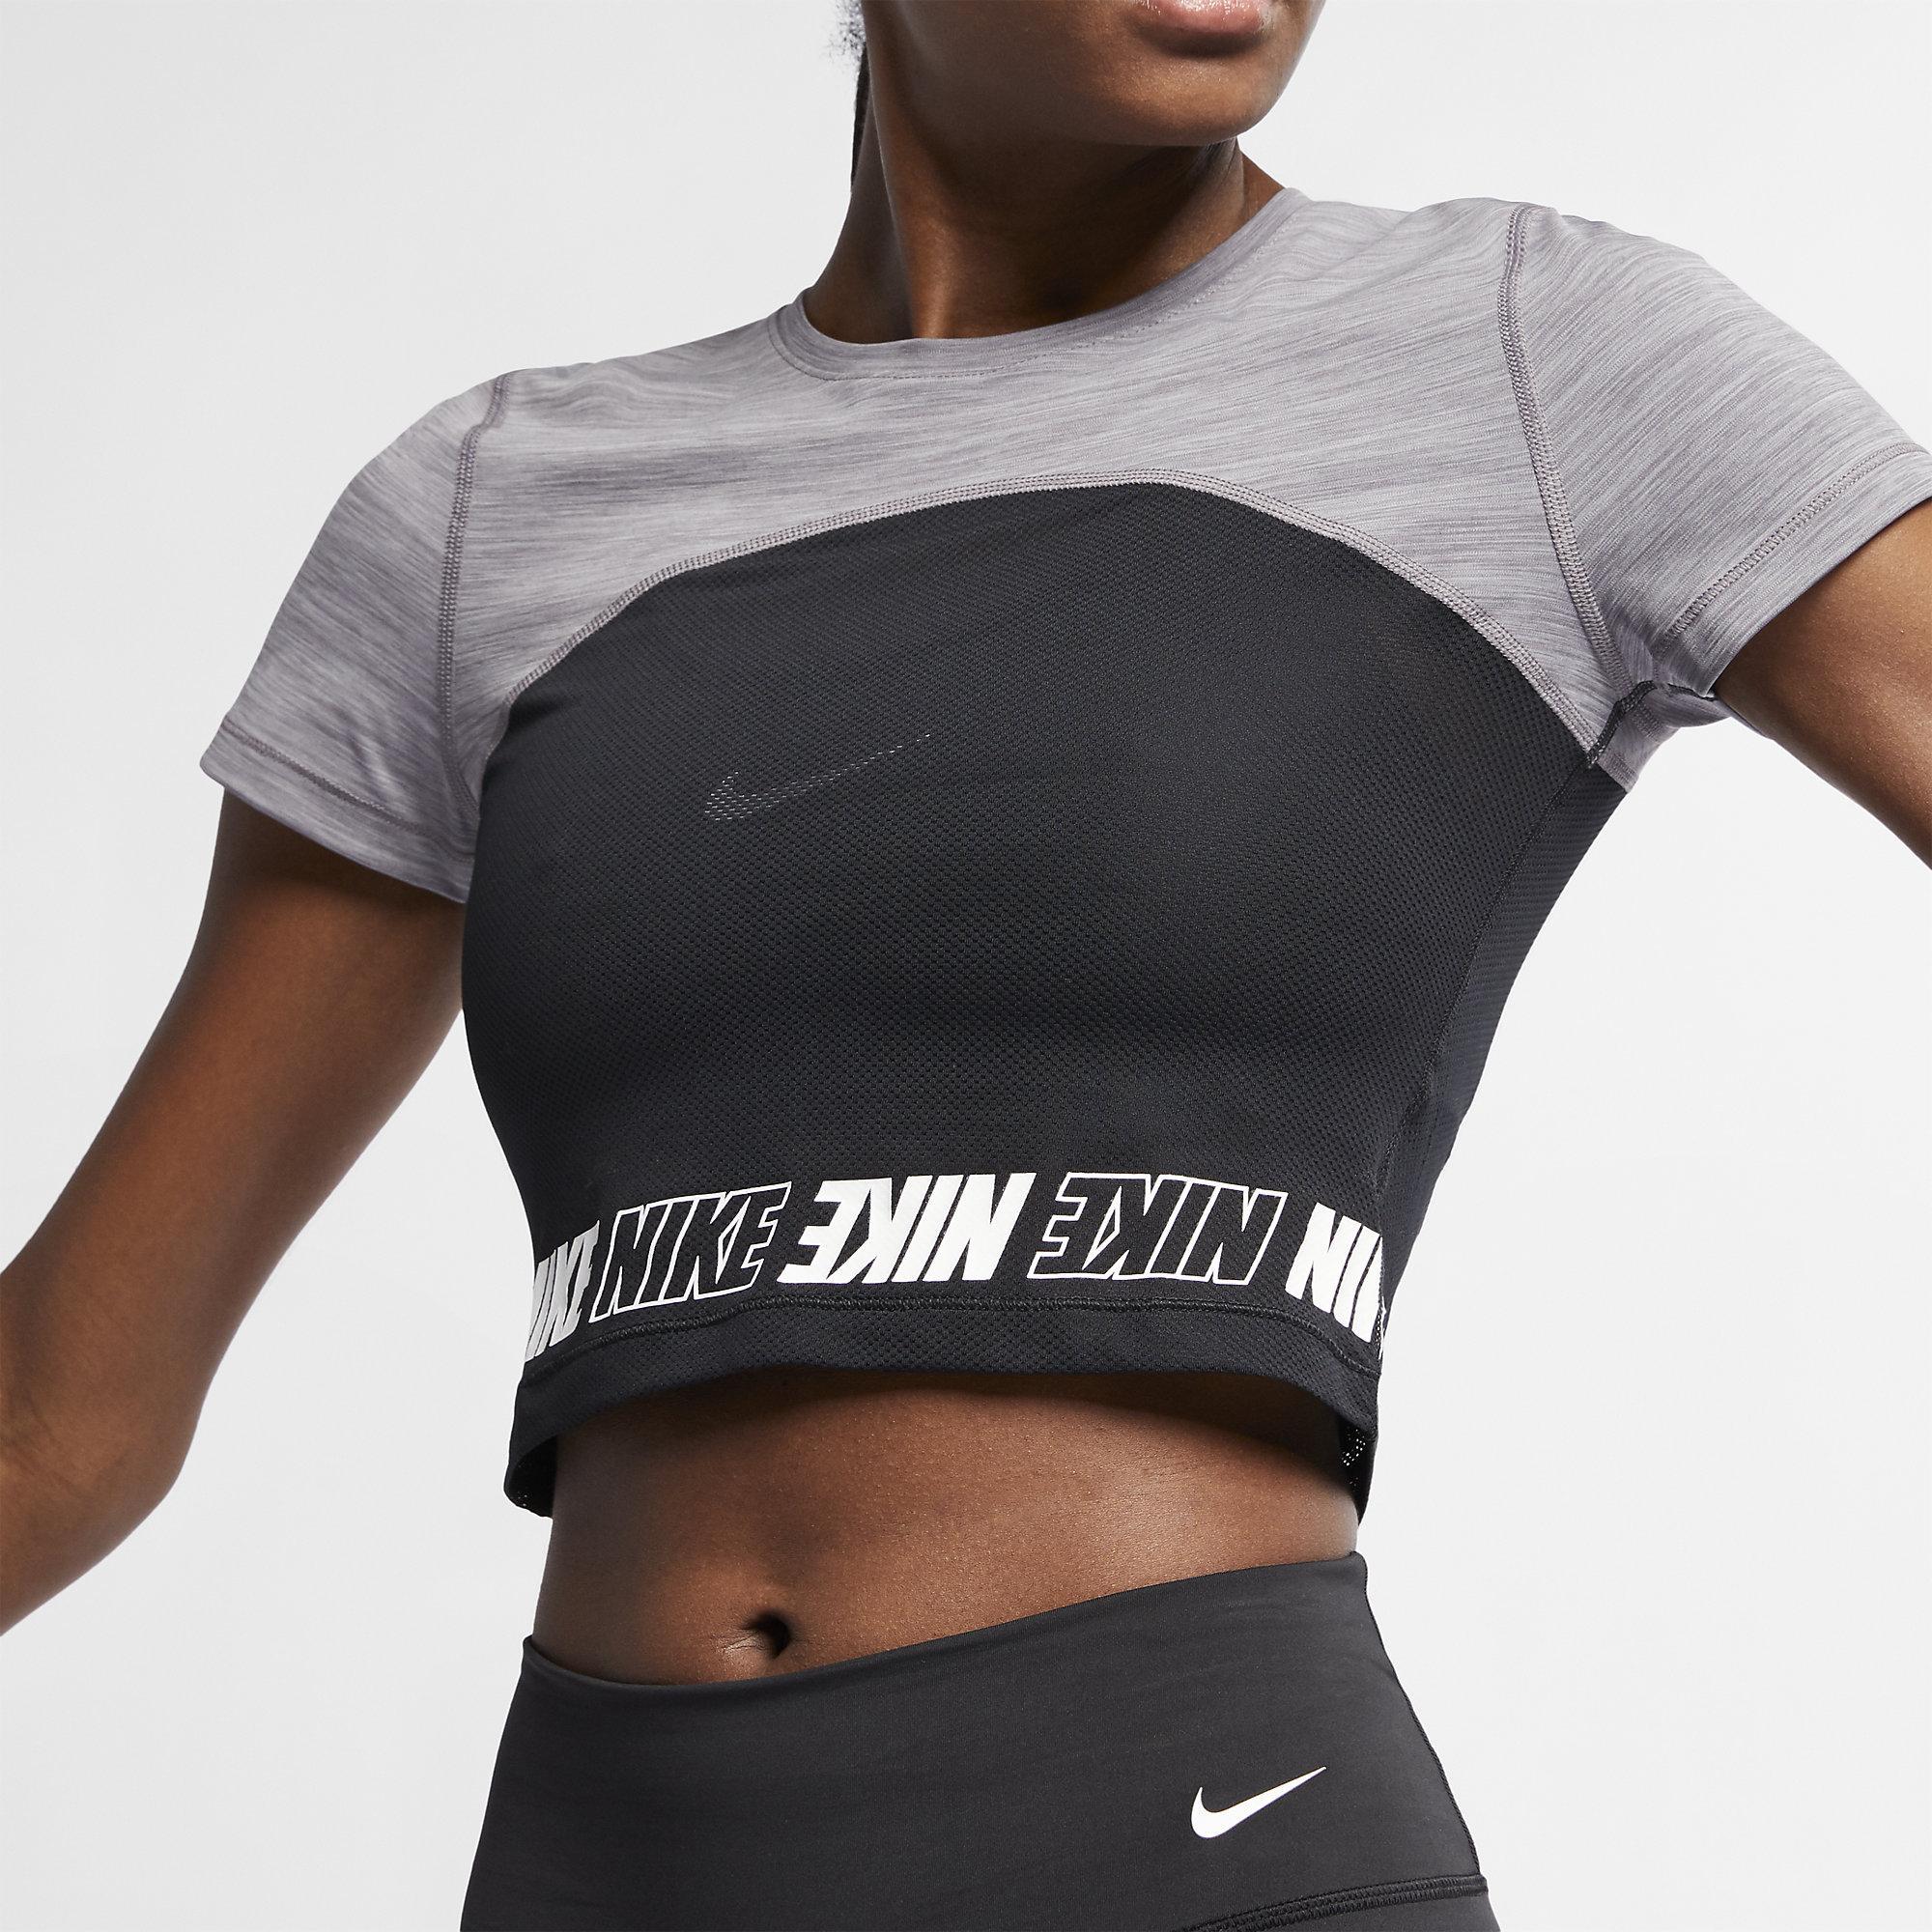 202fd9d64543b Nike Womens Pro Short-Sleeve Crop Top- Gunsmoke Heather White ...